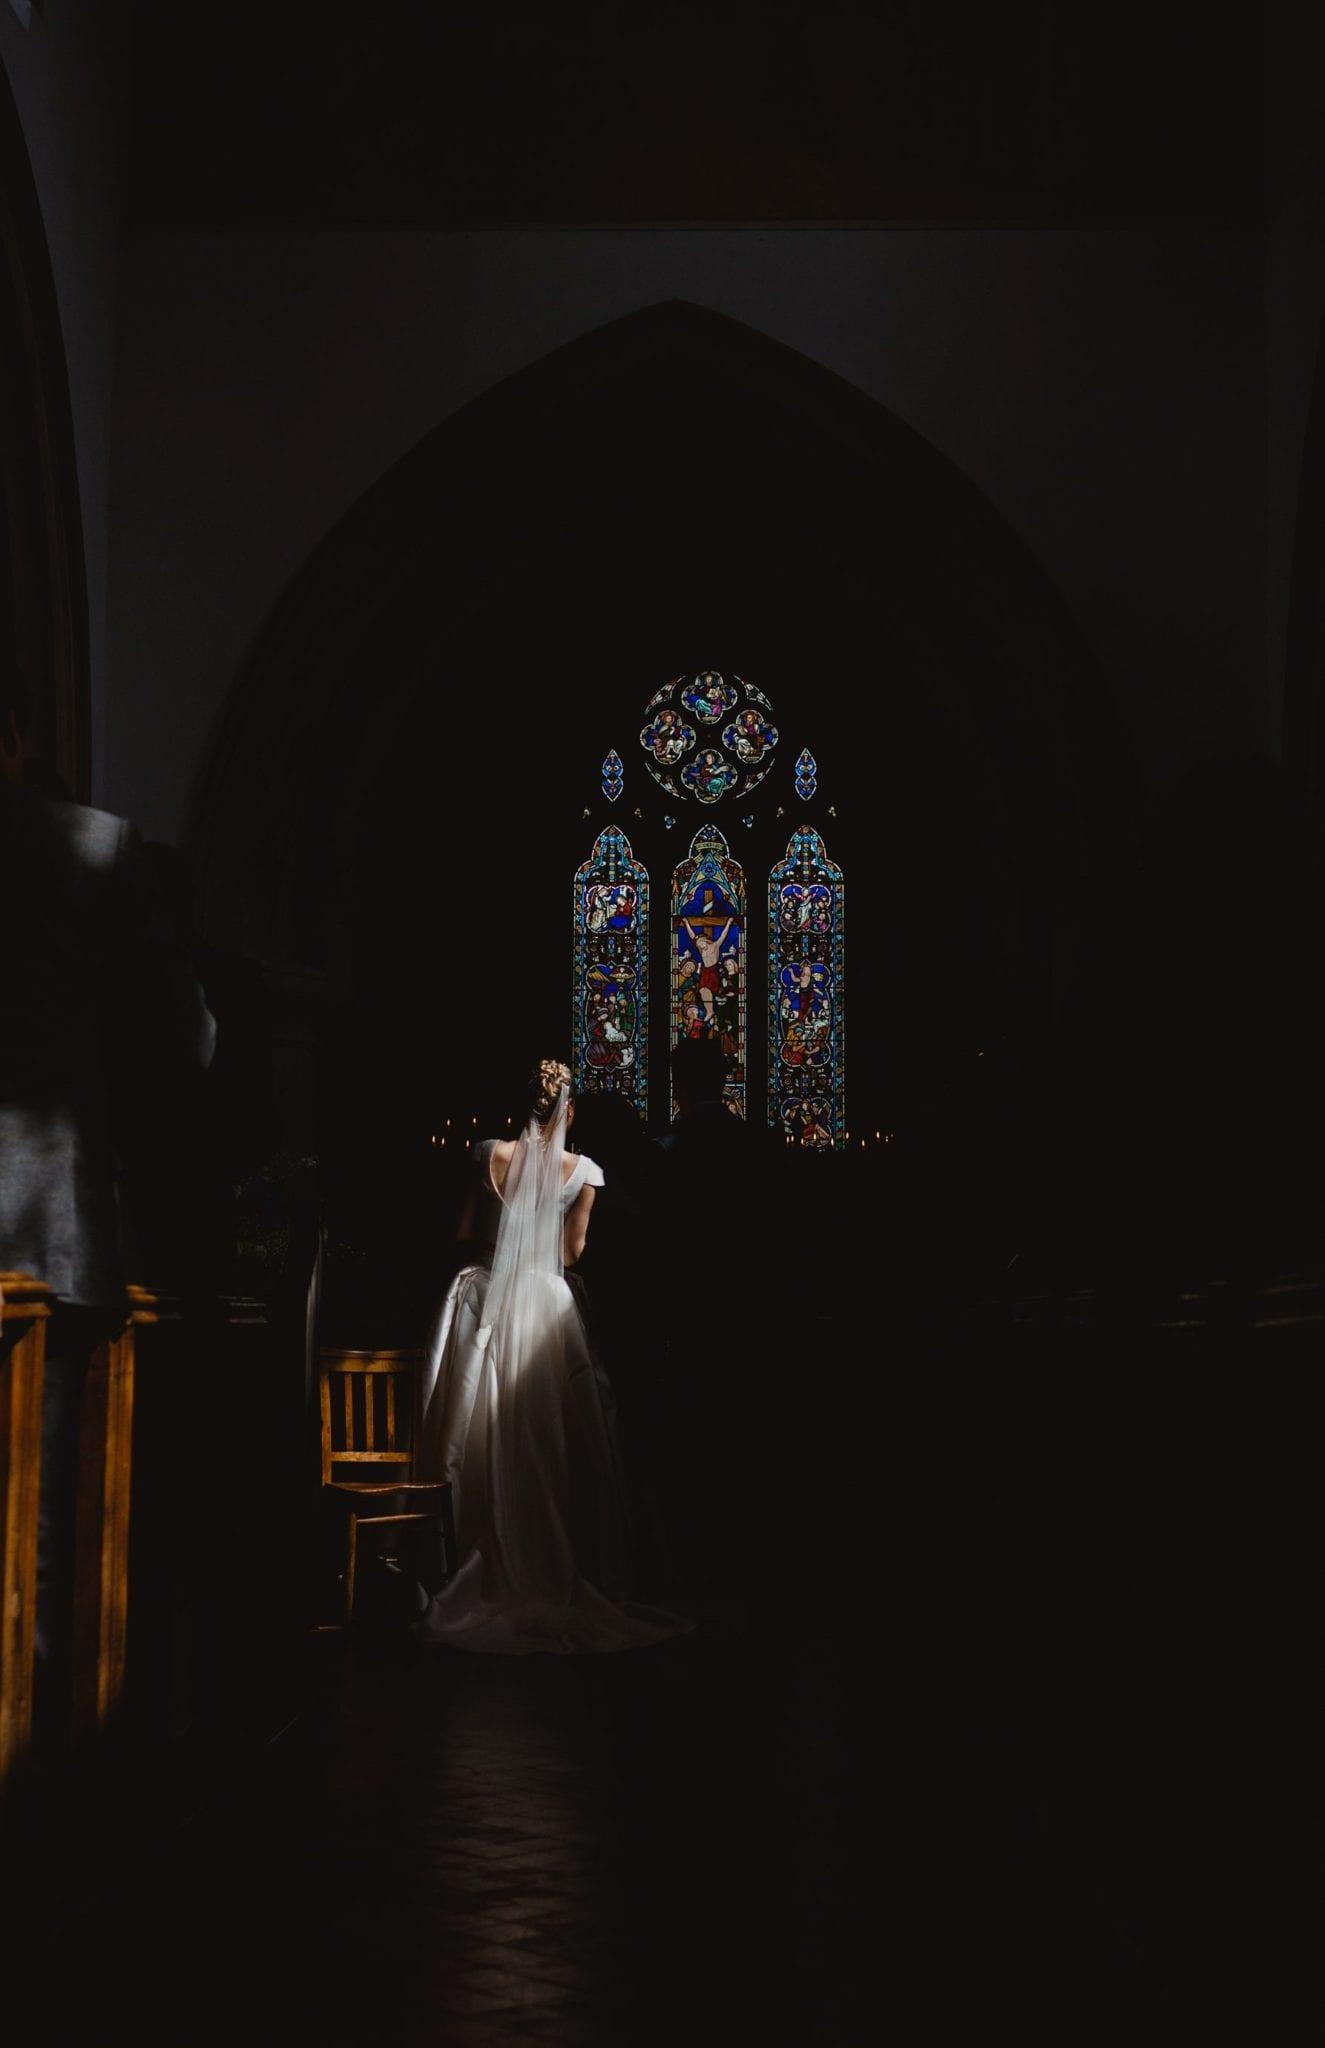 Light on the bride at a church wedding in Bucks